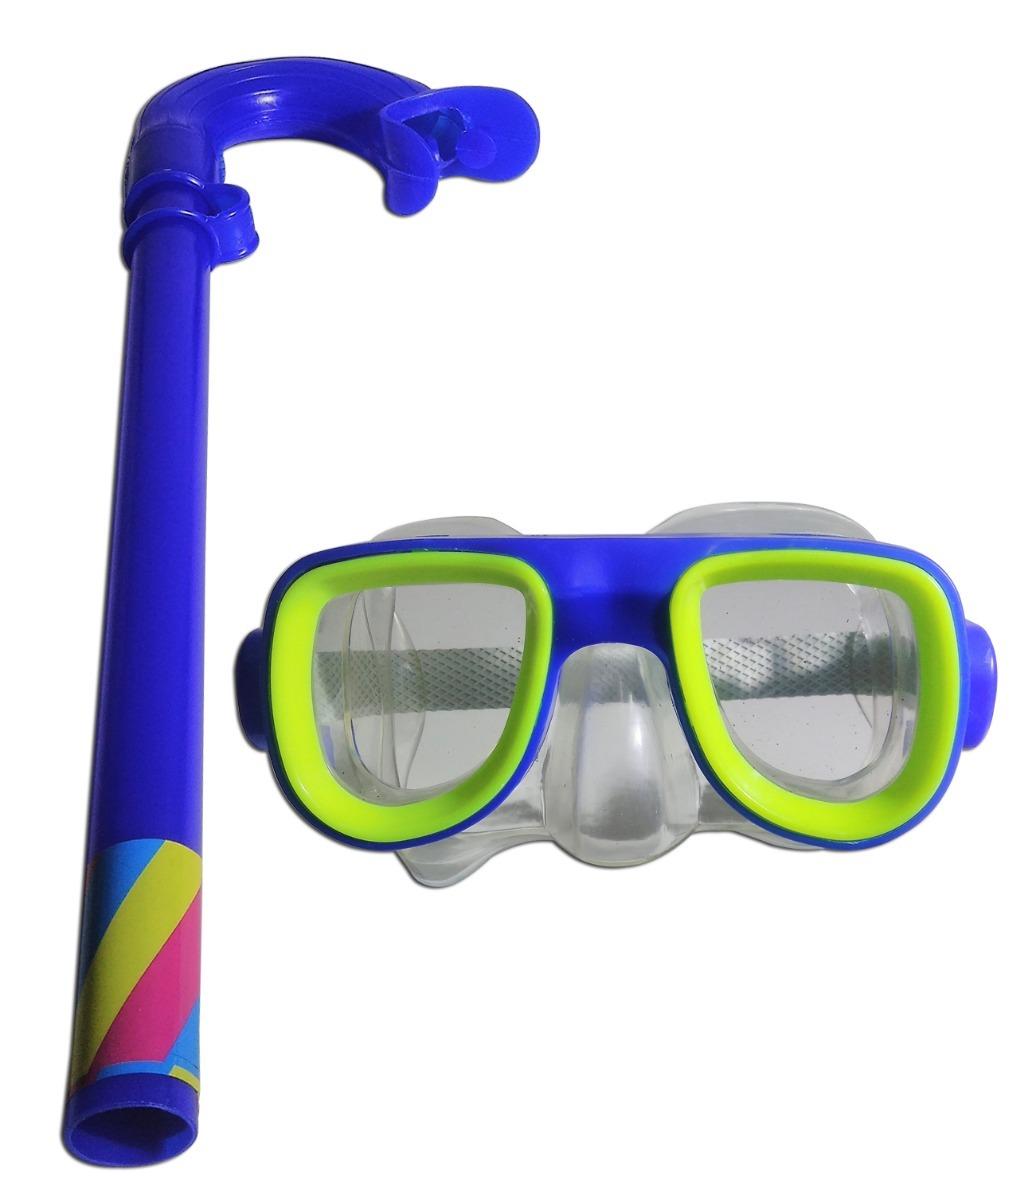 260246c8b9d3b kit de mergulho infantil óculos respirador swim feilang. Carregando zoom.